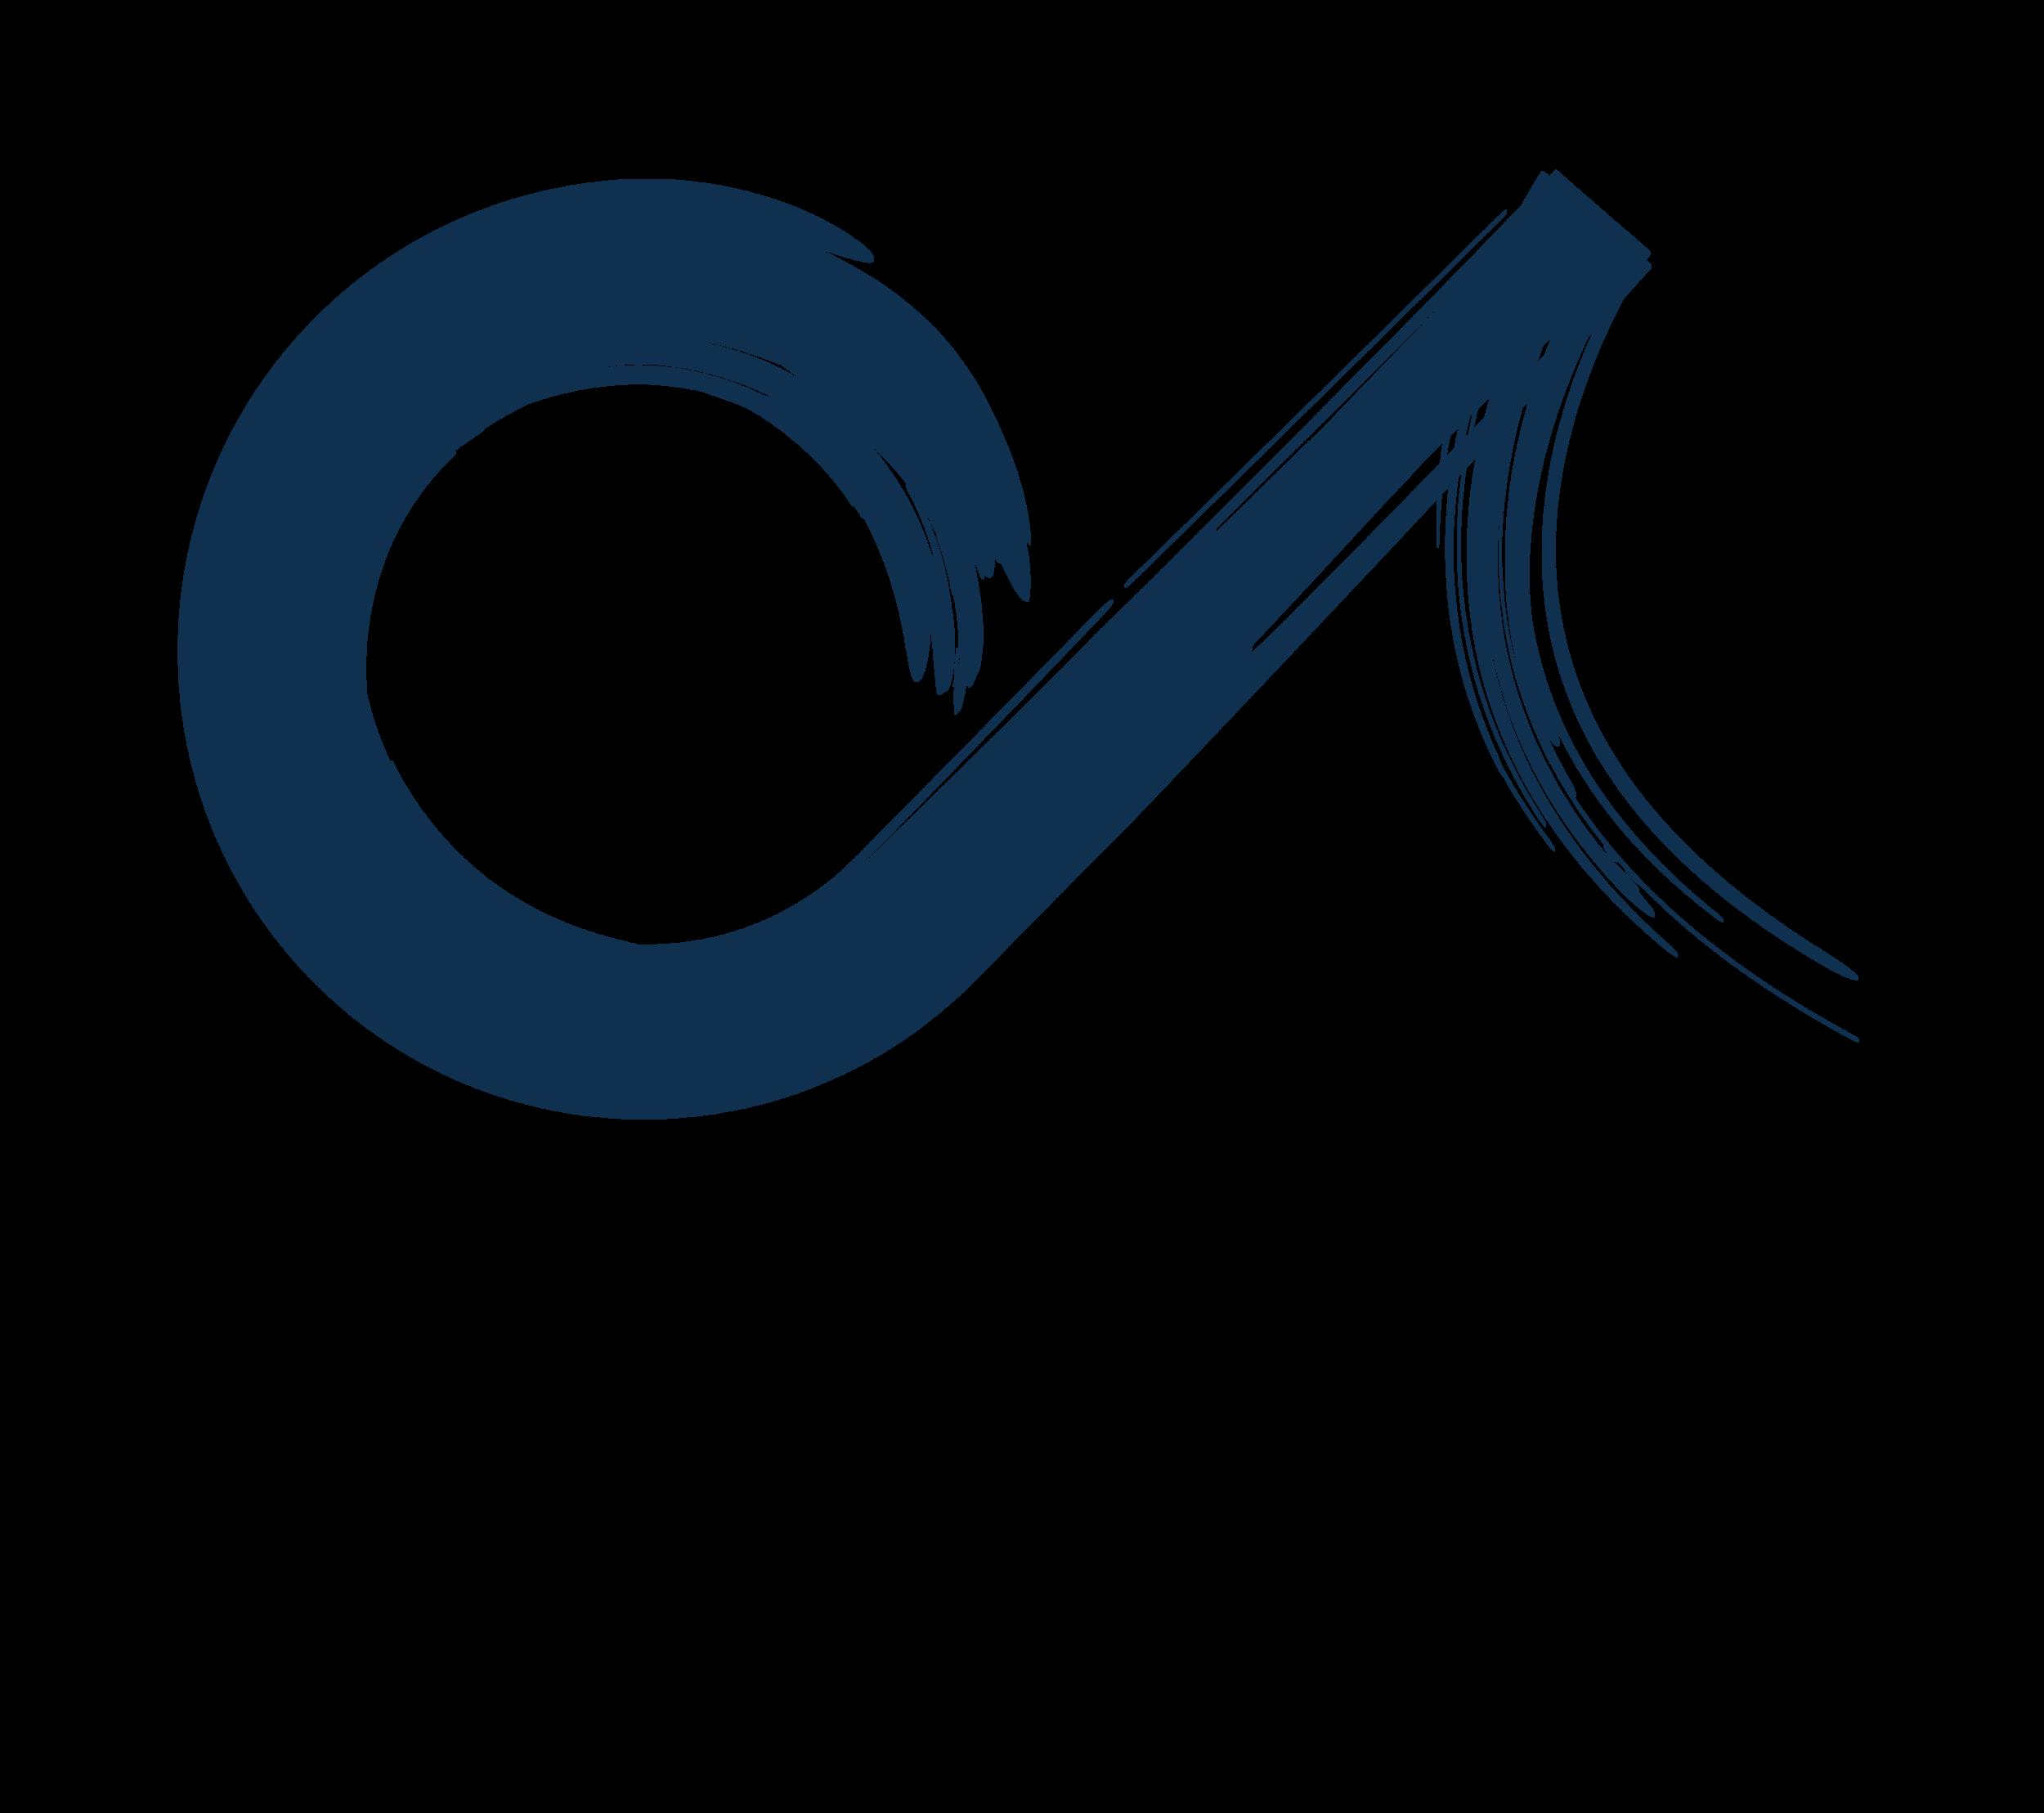 JCParks_CAC-NoteLogo 0518 BlueBlack.png